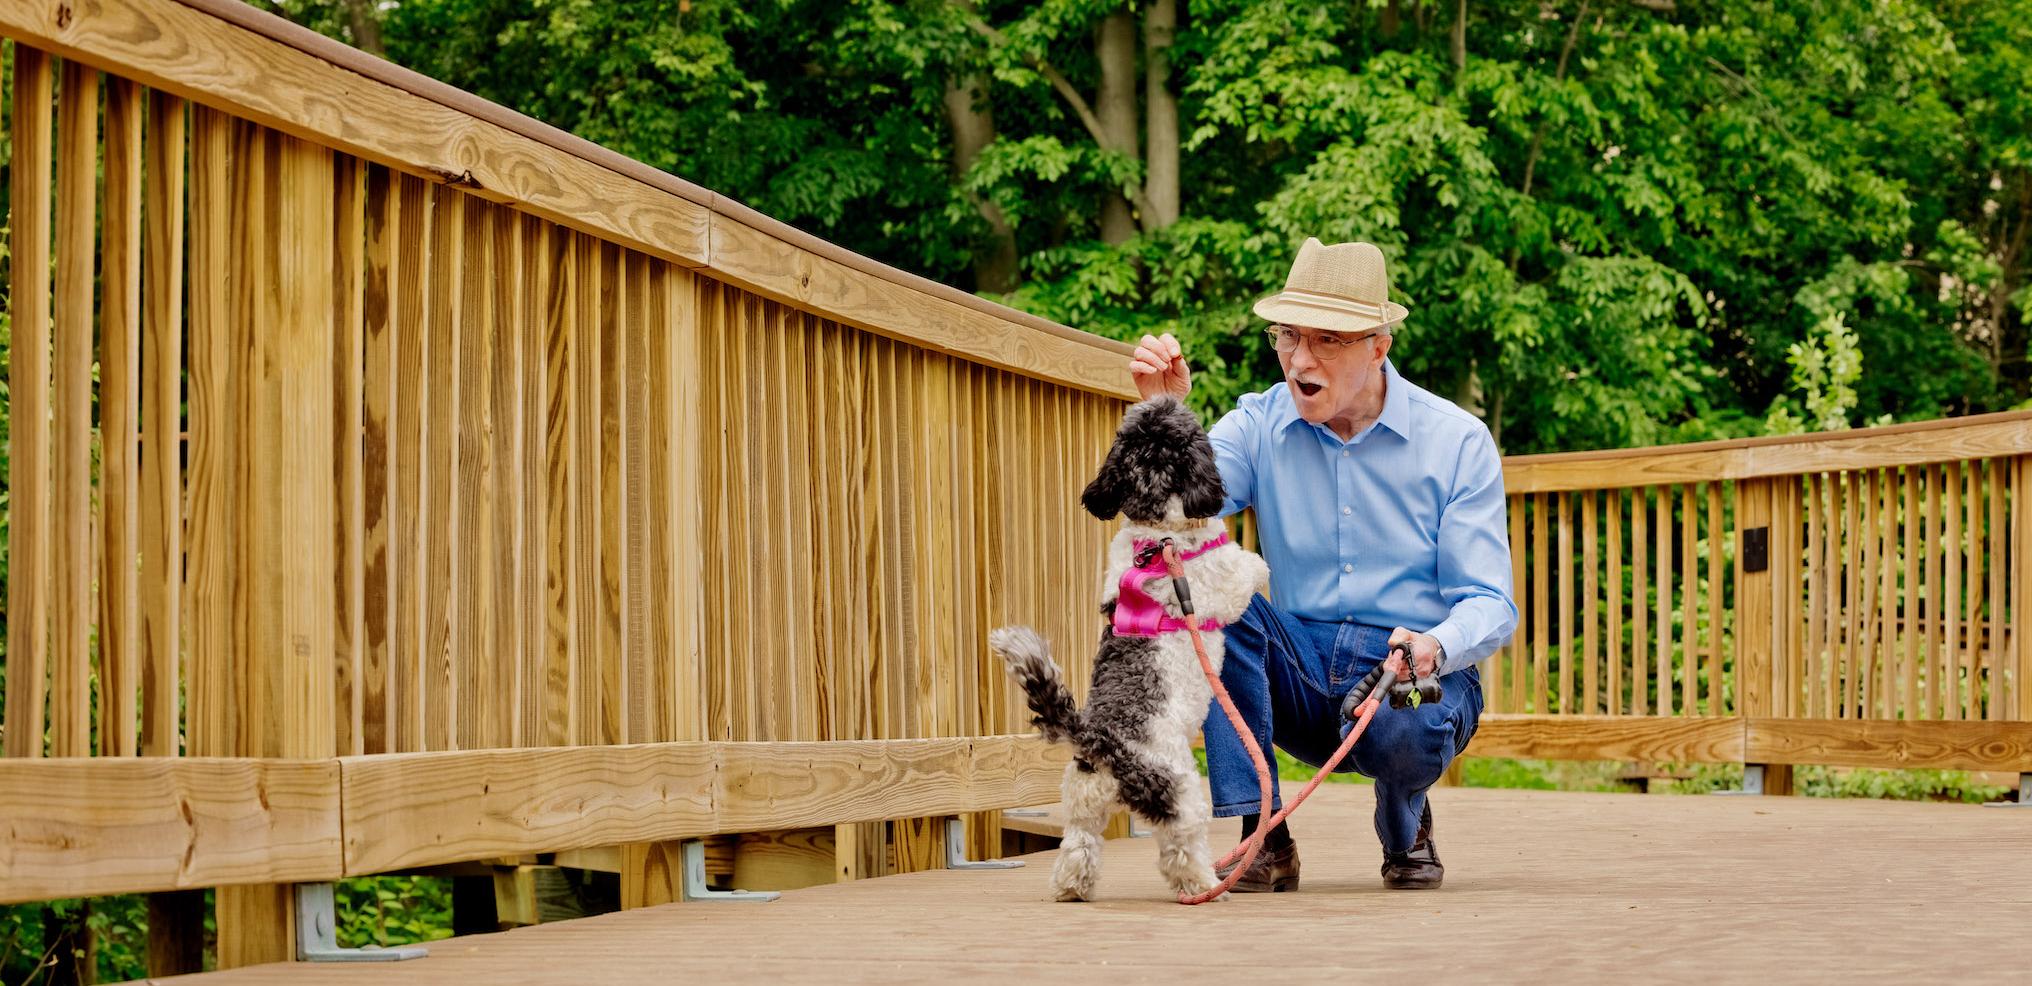 man with dog at senior living community